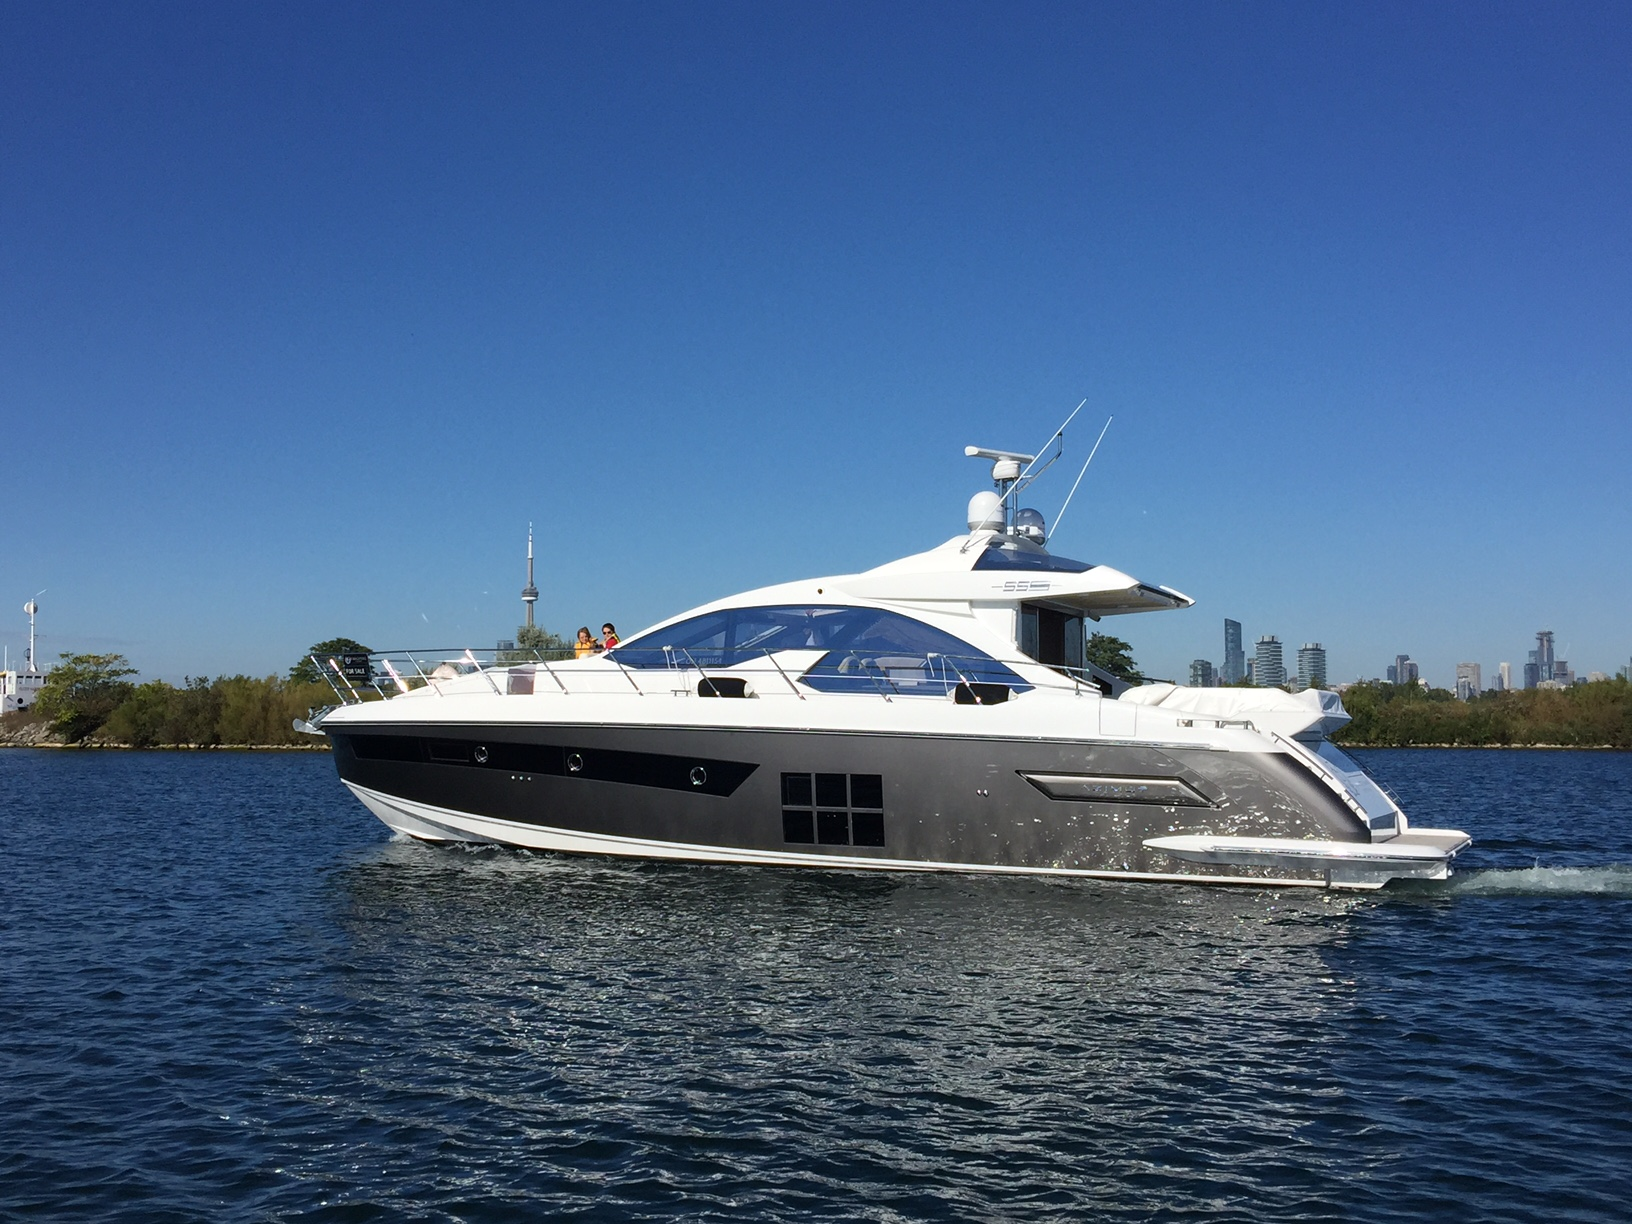 Azimut 55S 2016 Ita Yachts Canada Ita Yachts Canada